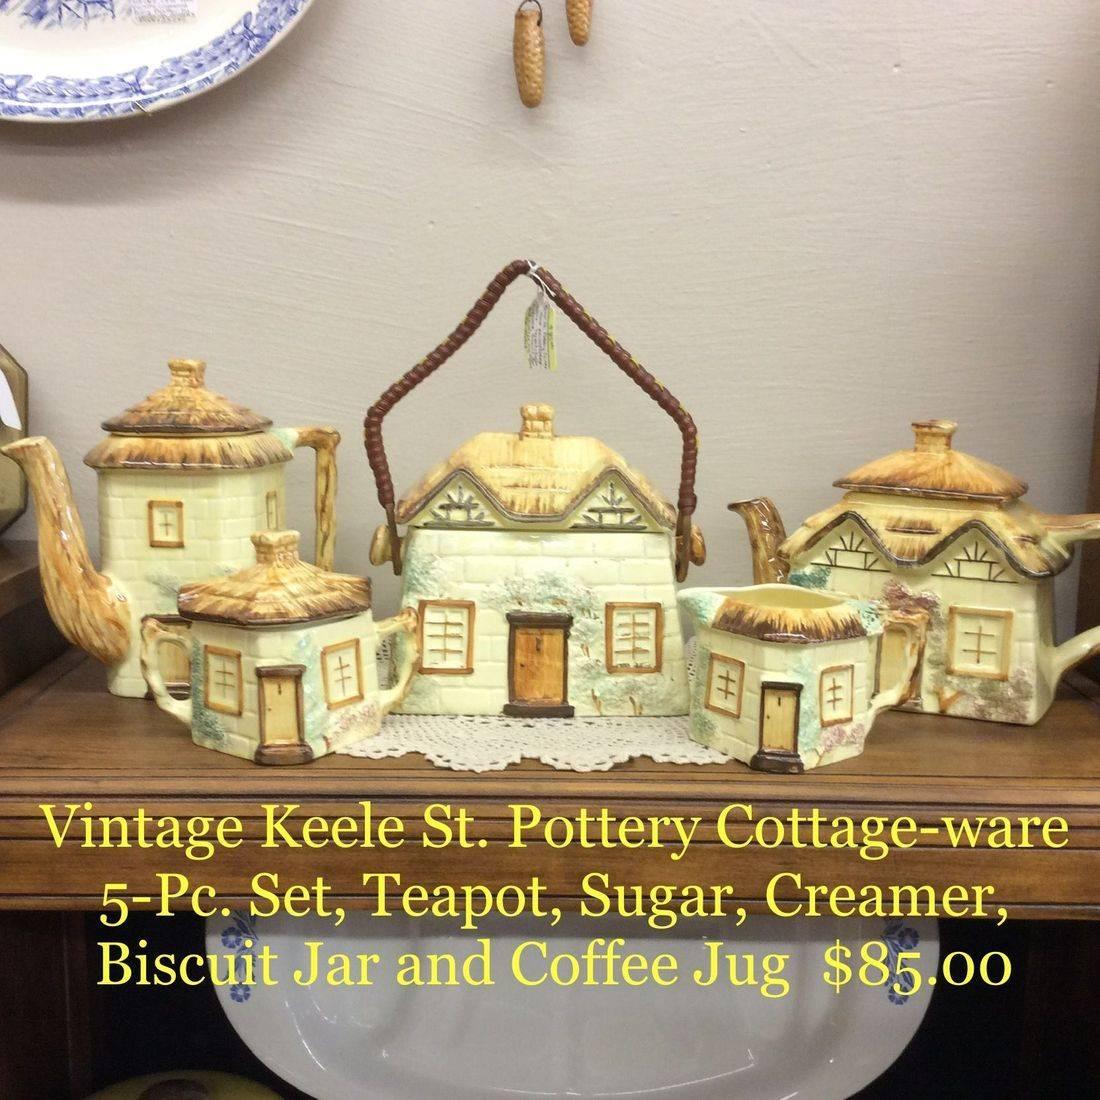 Vintage Keele St. Pottery Co. Hand-Painted Cottageware 5-pc. Set, Teapot, Sugar, Creamer, Biscuit Jar and Coffee Jug   $85.00